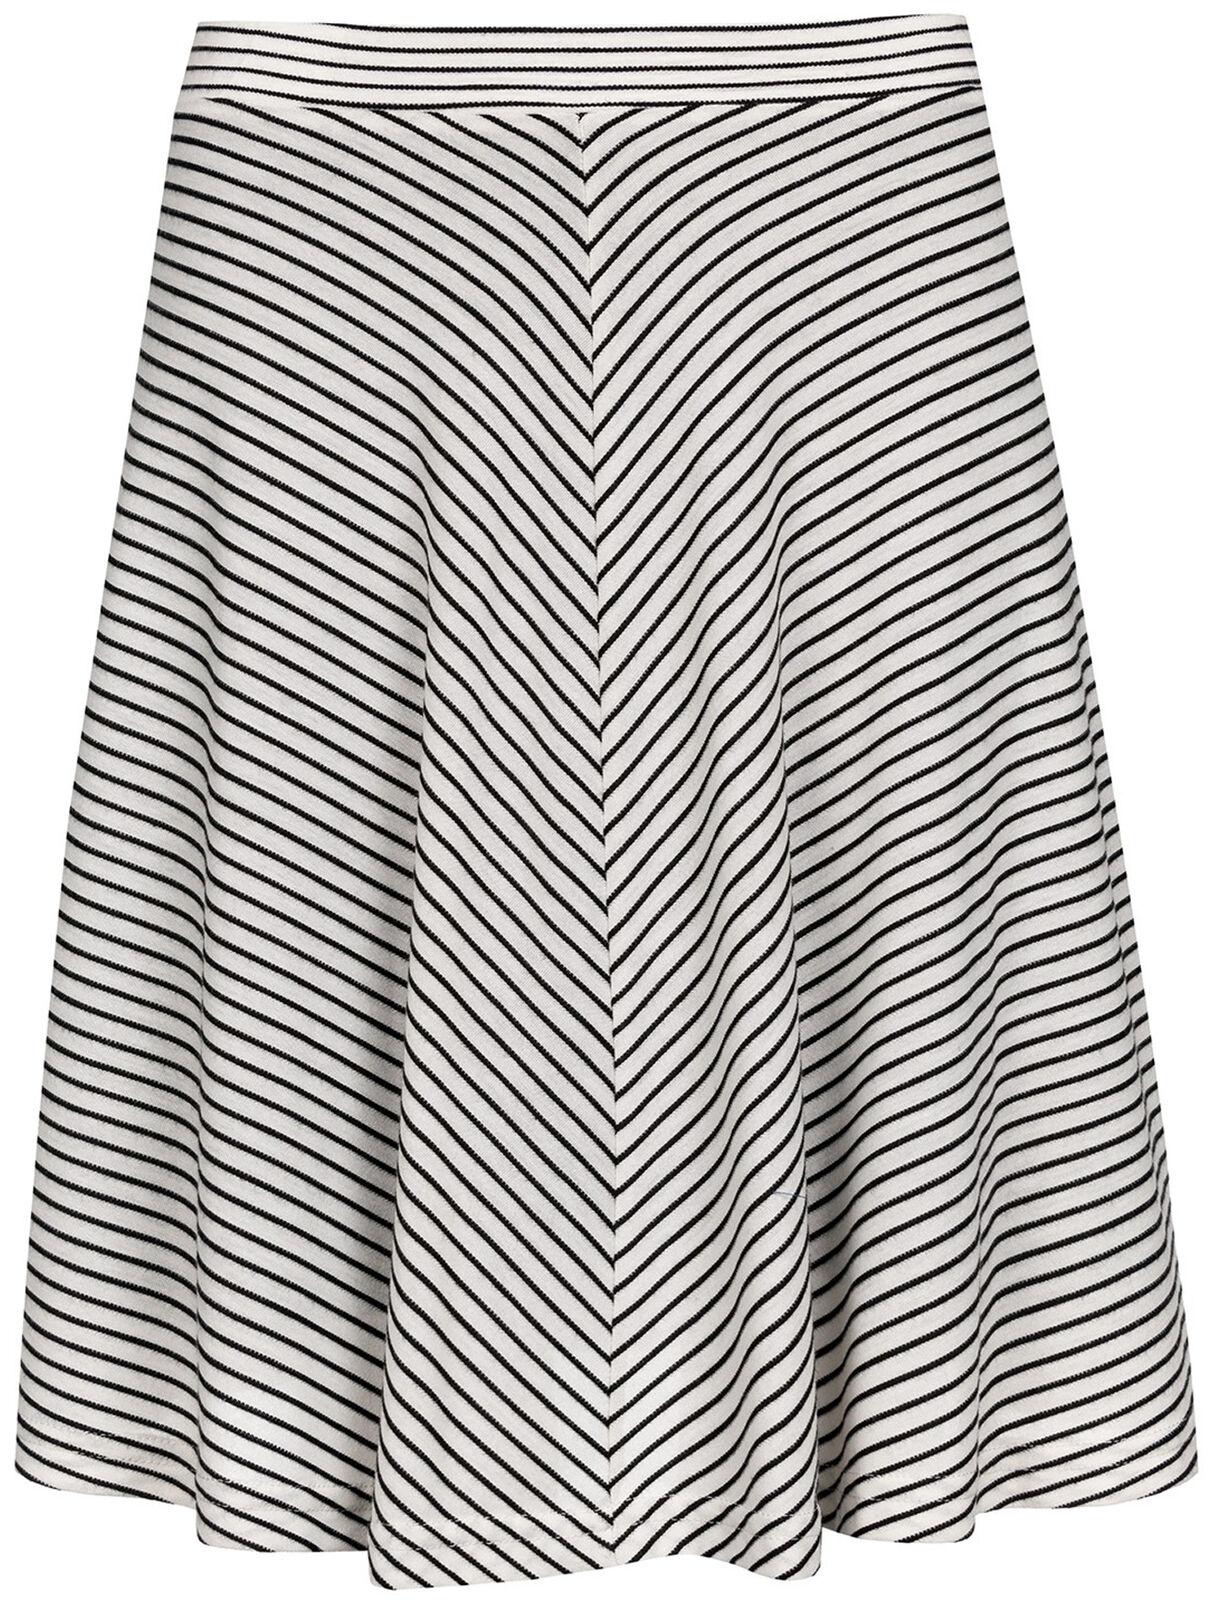 Vive Maria Capri Sailor Strisce Maritim Vintage Striped skirt rock rockabilly